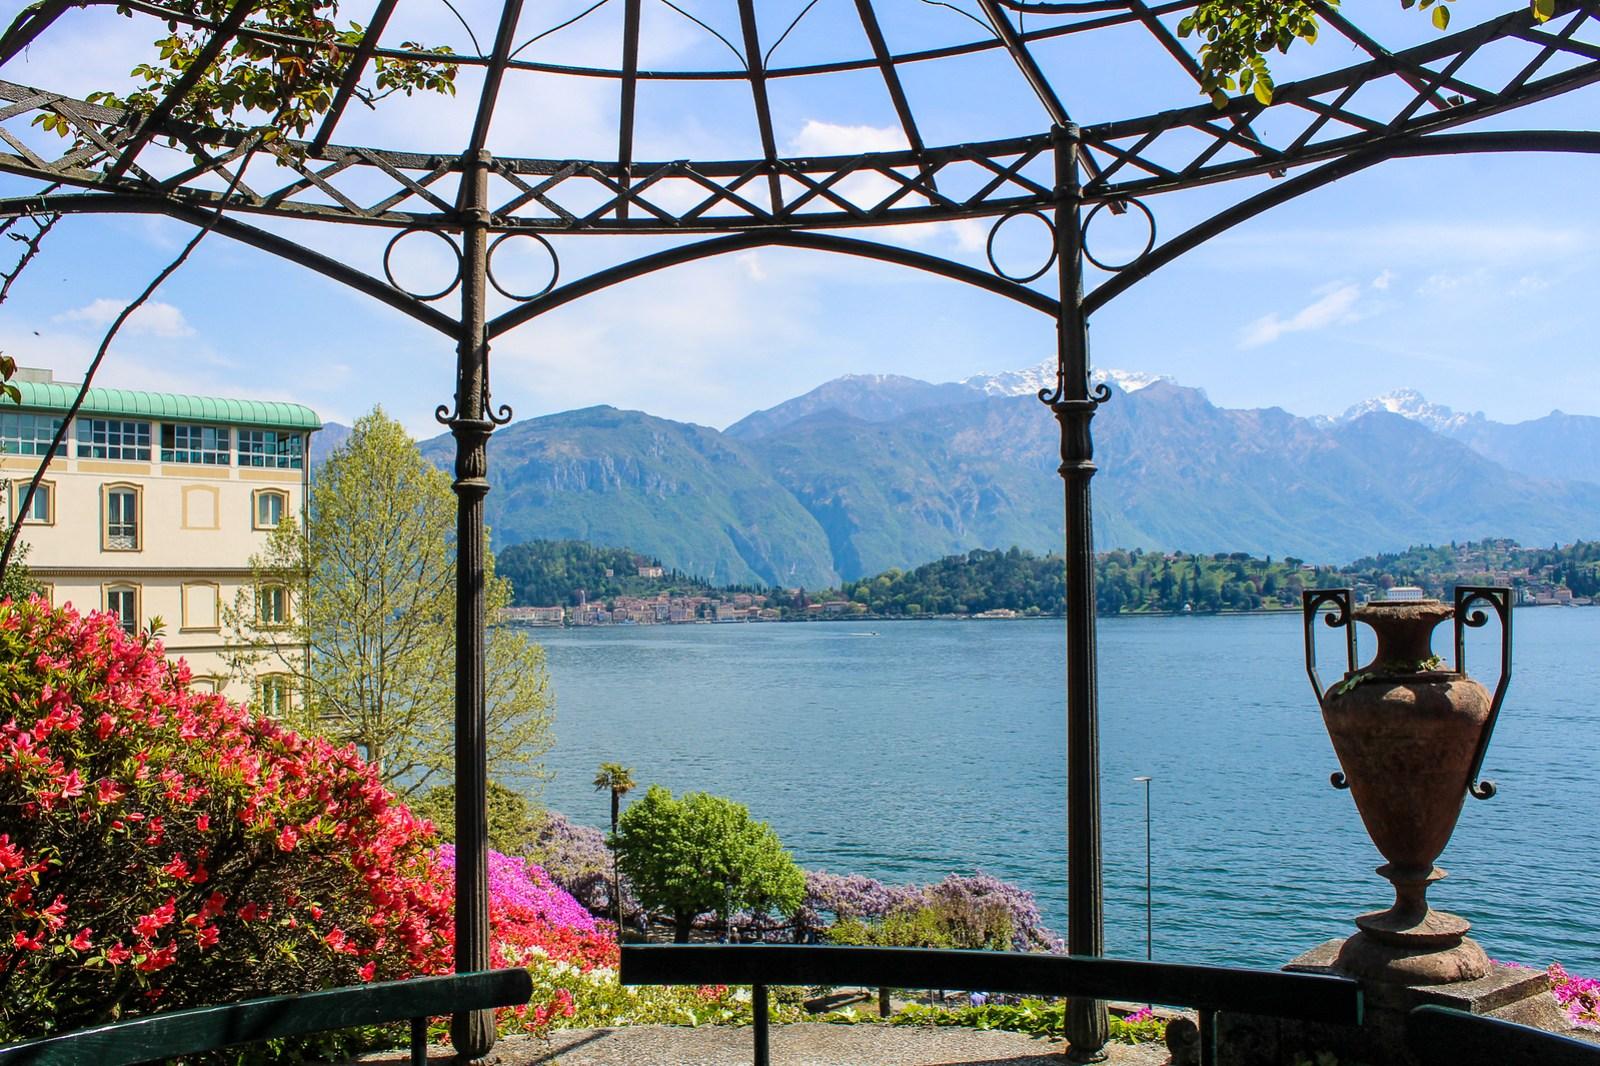 villa charlotta: the highlight of lake como day trips